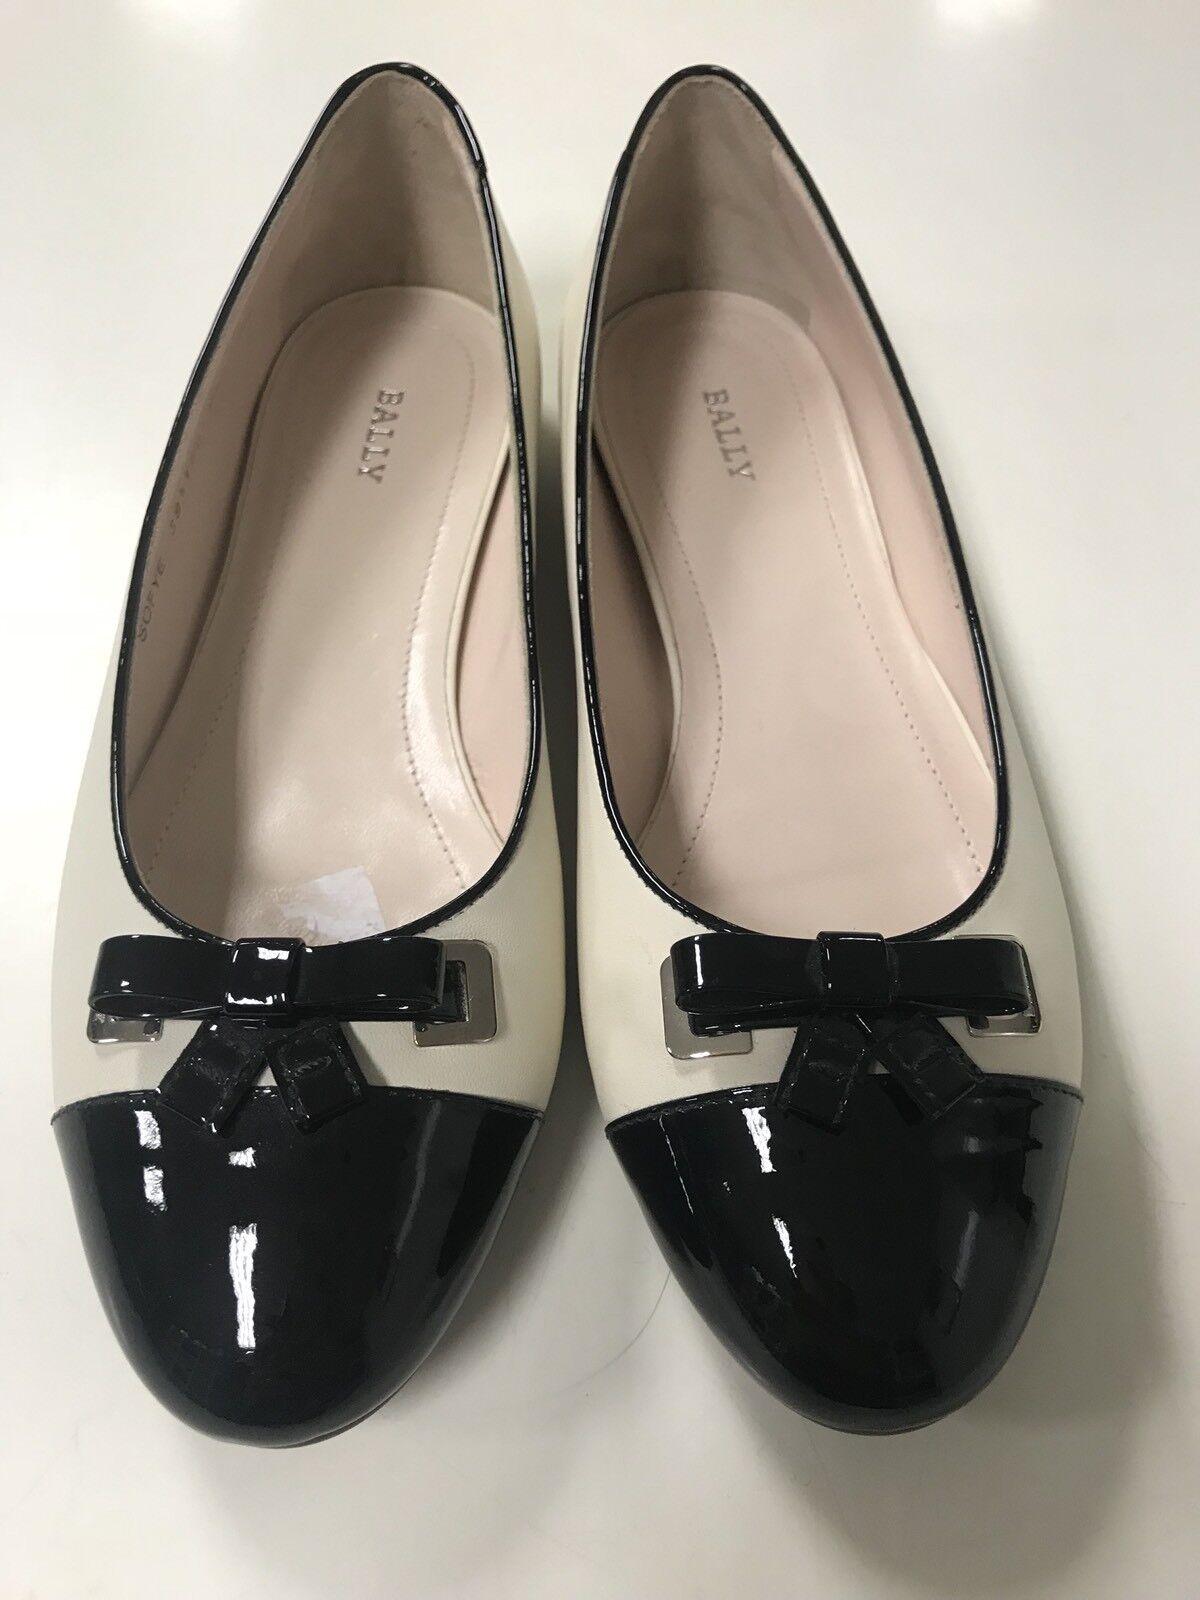 Bally Shoes Ballerine Ballerine Ballerine Ballet Flats Donna Donna Size 39,5 d6dc79